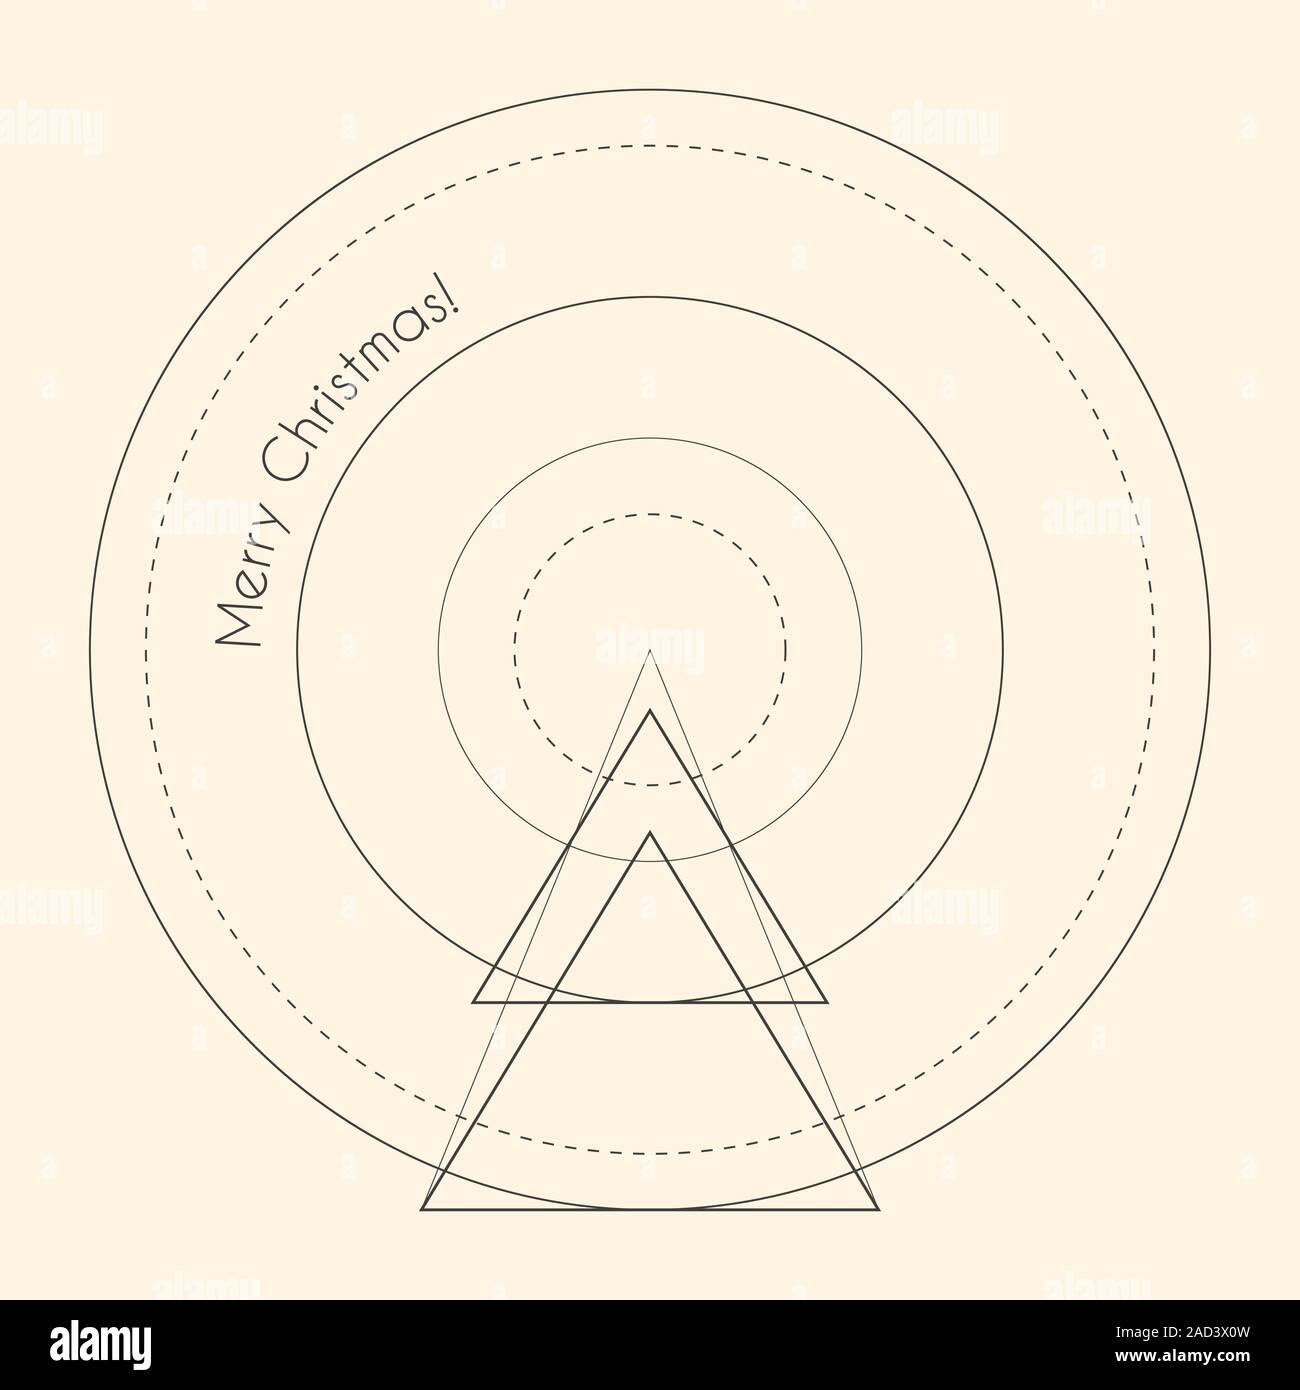 Geometric Line Art Template from c8.alamy.com